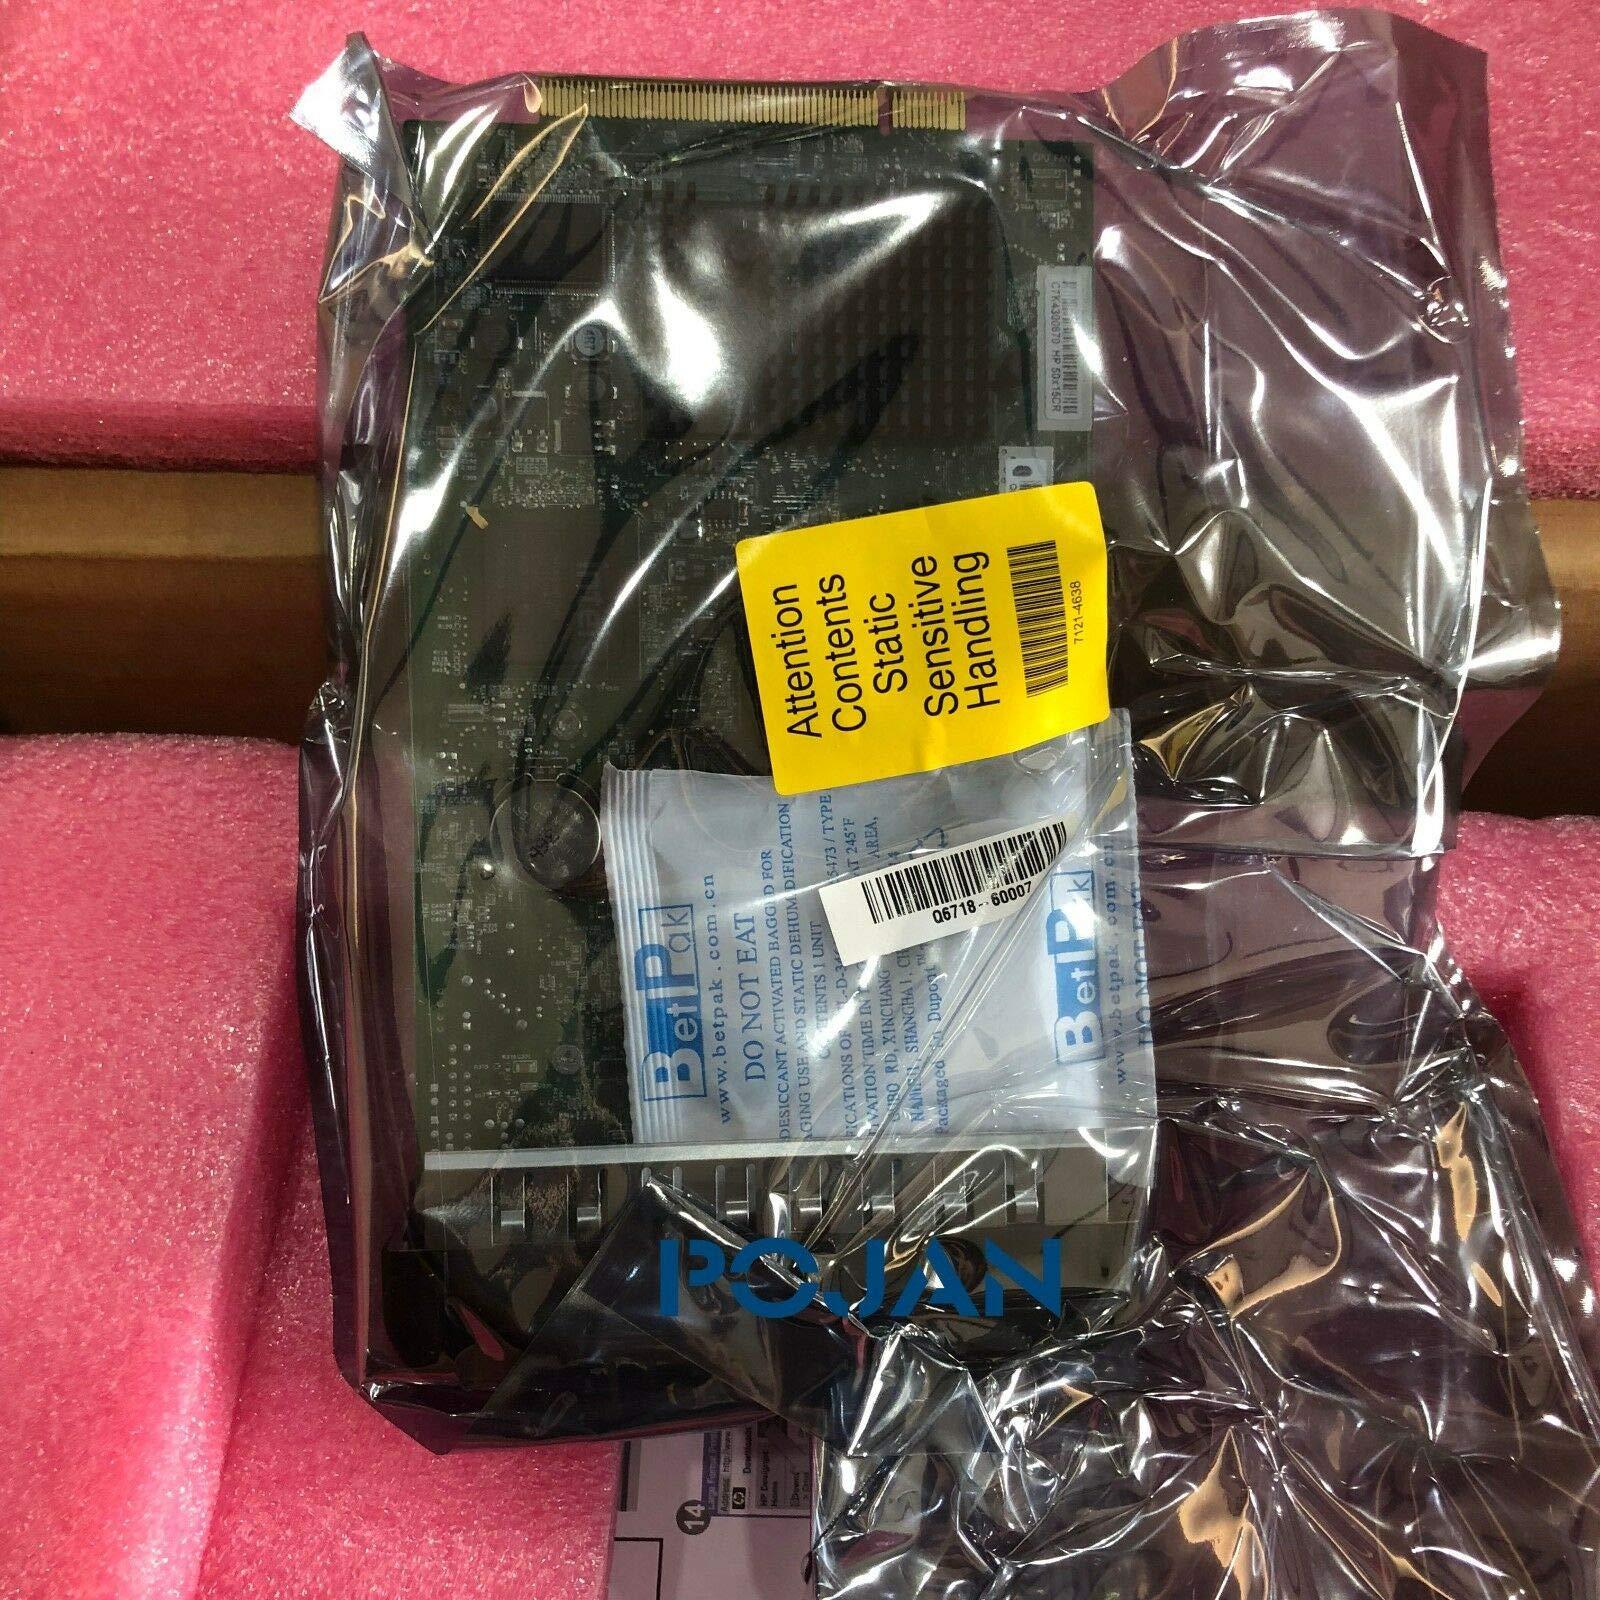 POJAN Q6683-67030 Q6683-60193 for Designjet T610 T1100 PS Formatter Board New by POJAN (Image #3)